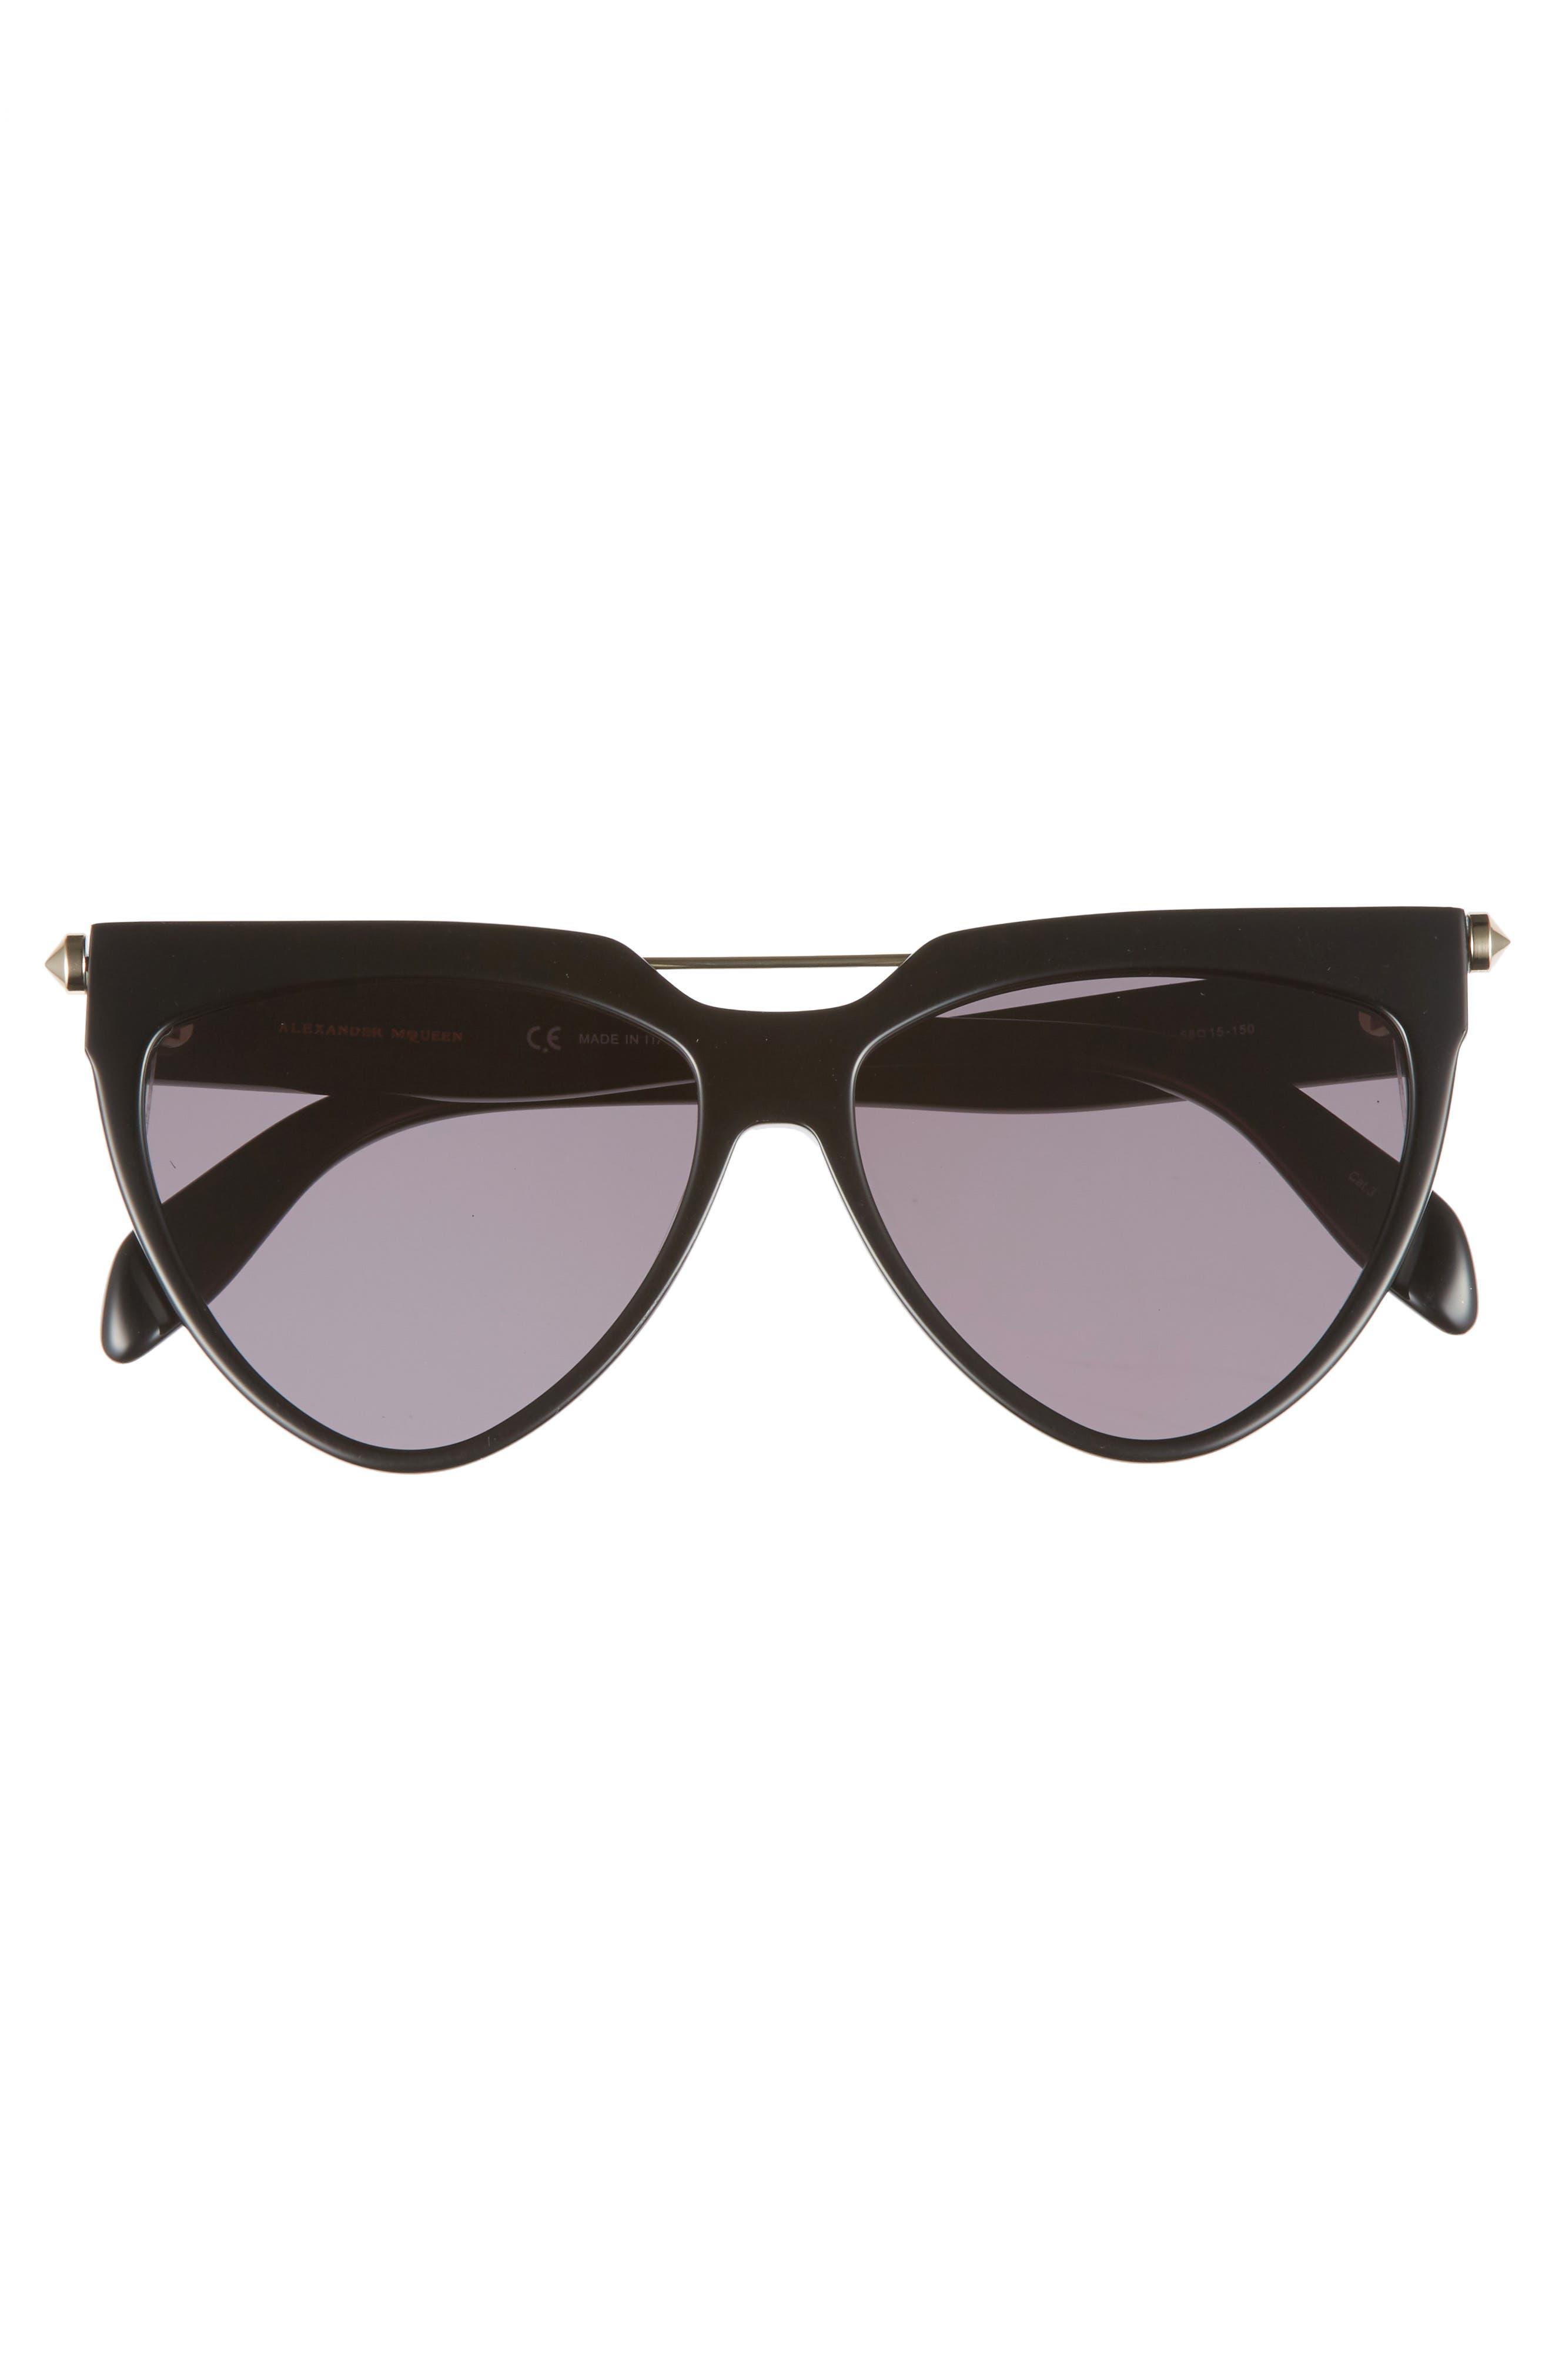 58mm Cat Eye Sunglasses,                             Alternate thumbnail 3, color,                             001